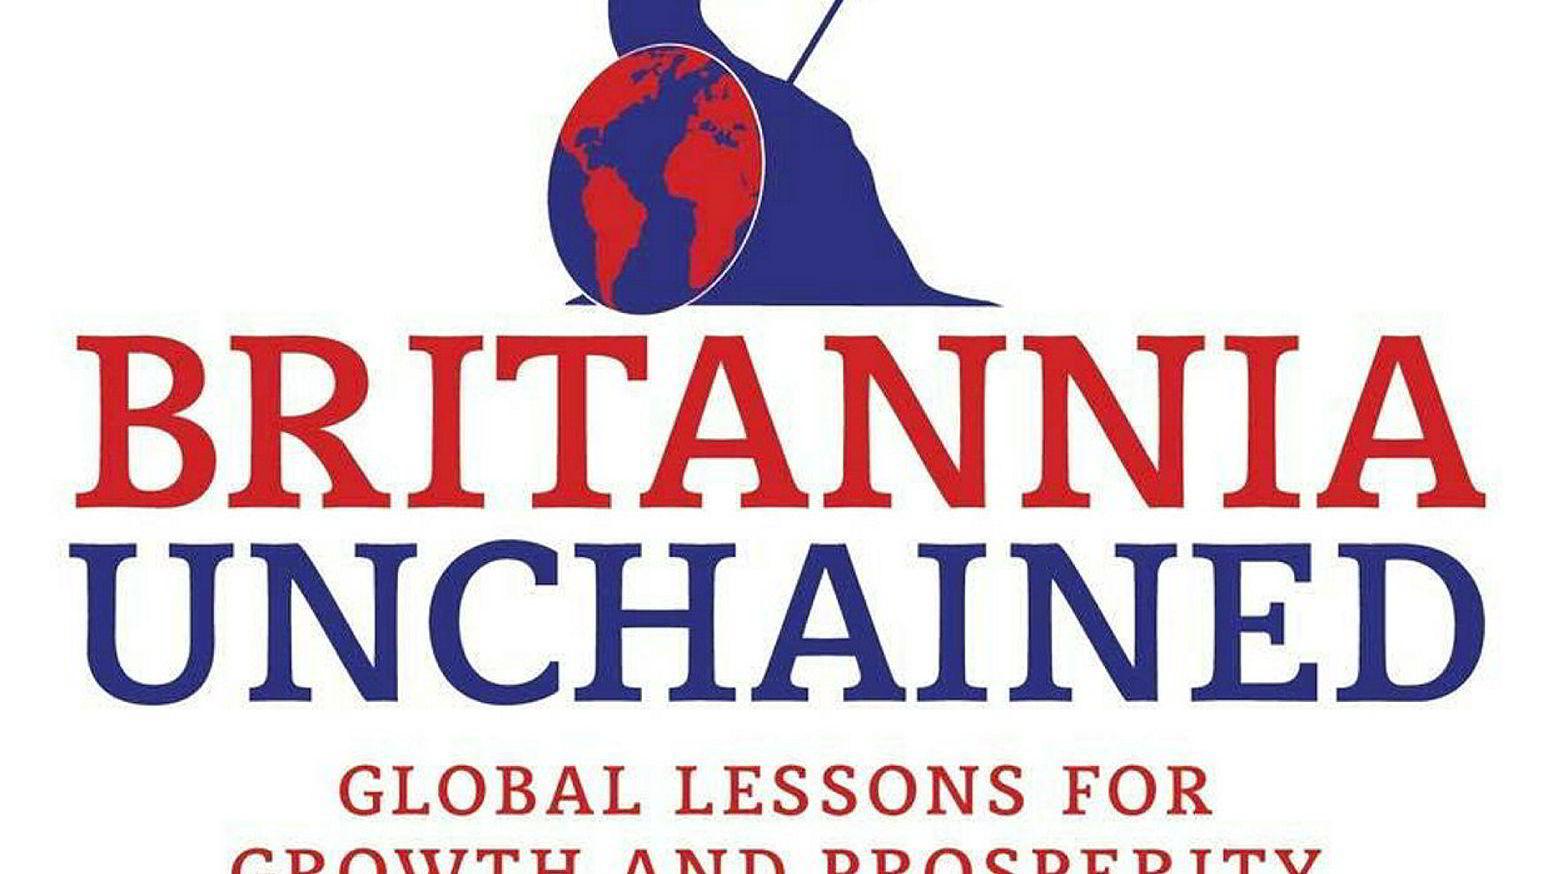 Britannia Unchained av Kwasi Kwarteng, Priti Patel og Dominic Raab